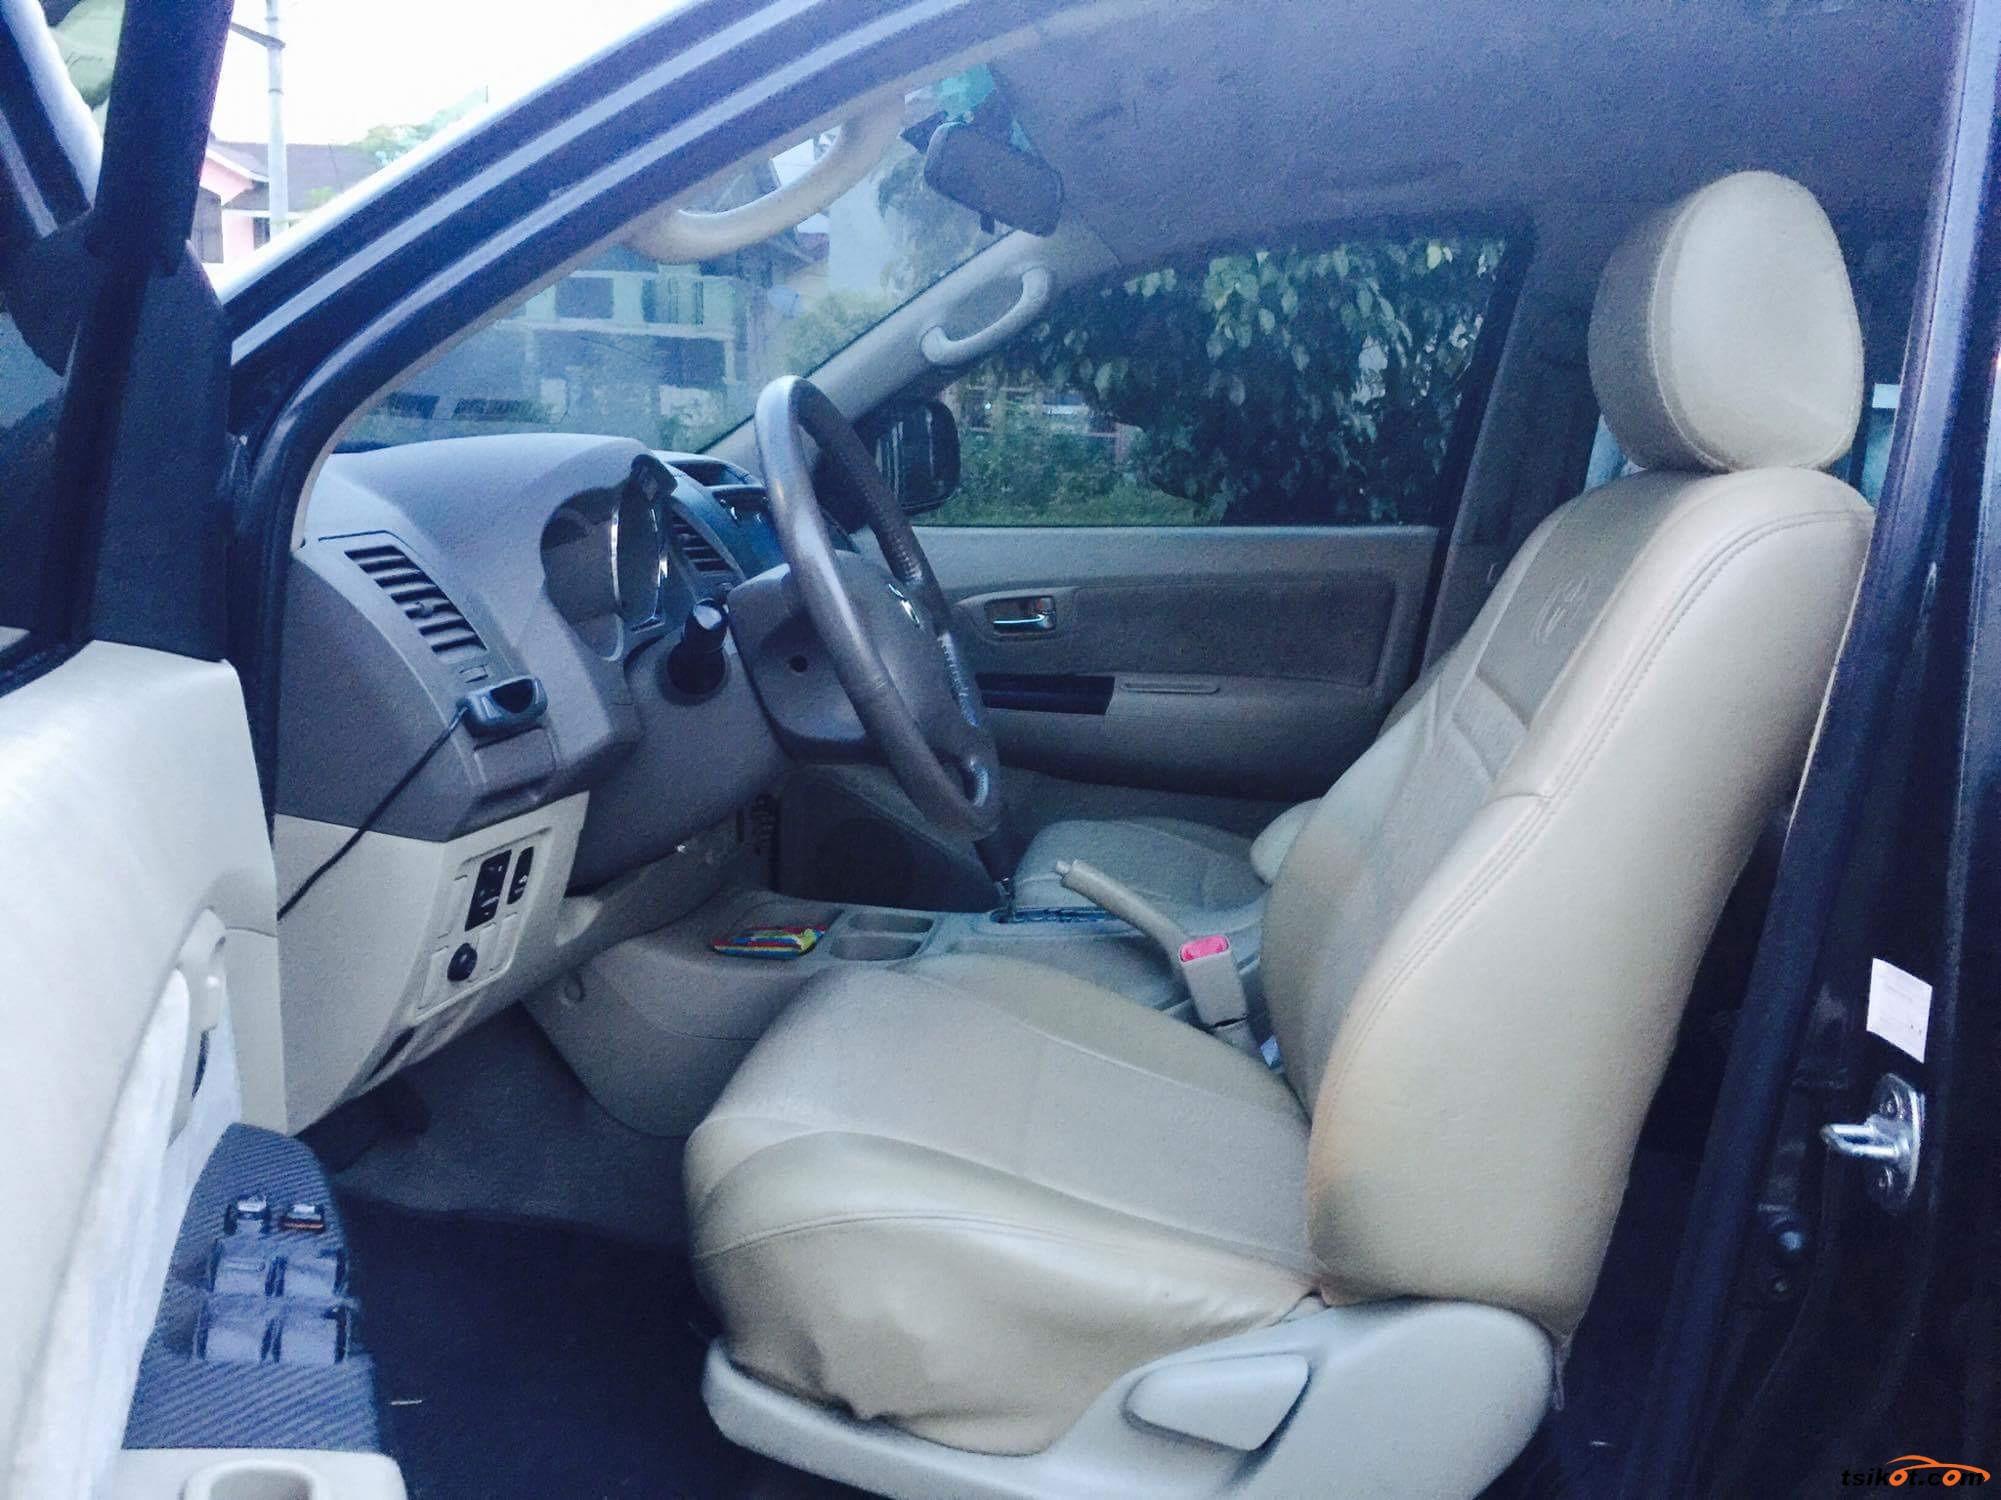 Toyota Fortuner 2006 - 2